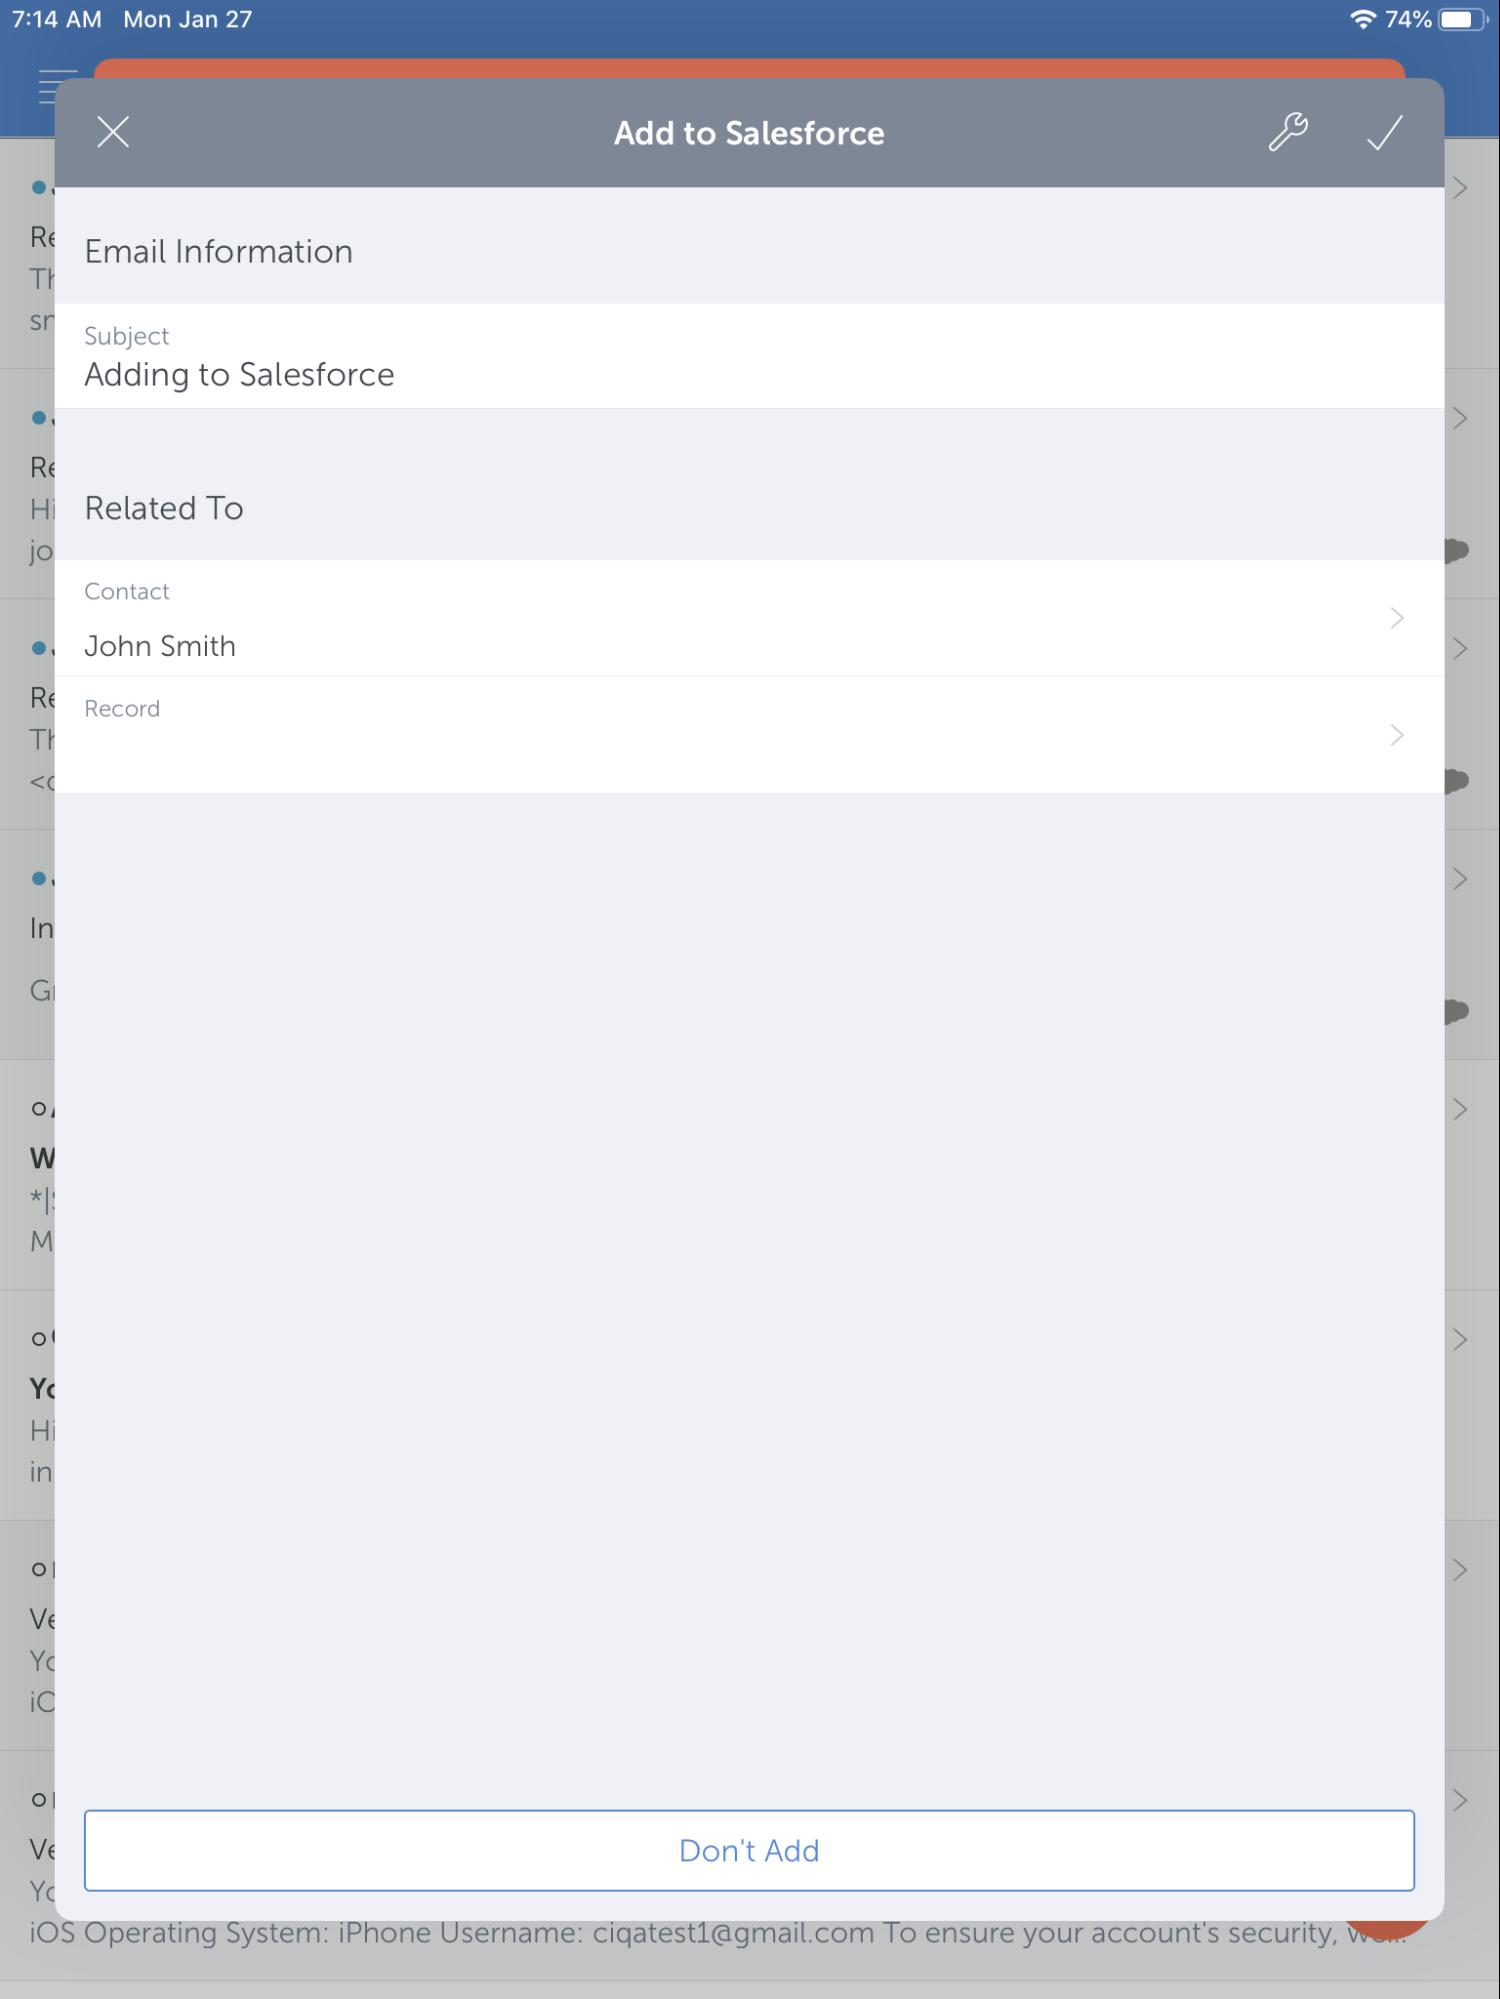 cirrus insight ipad app add to Salesforce